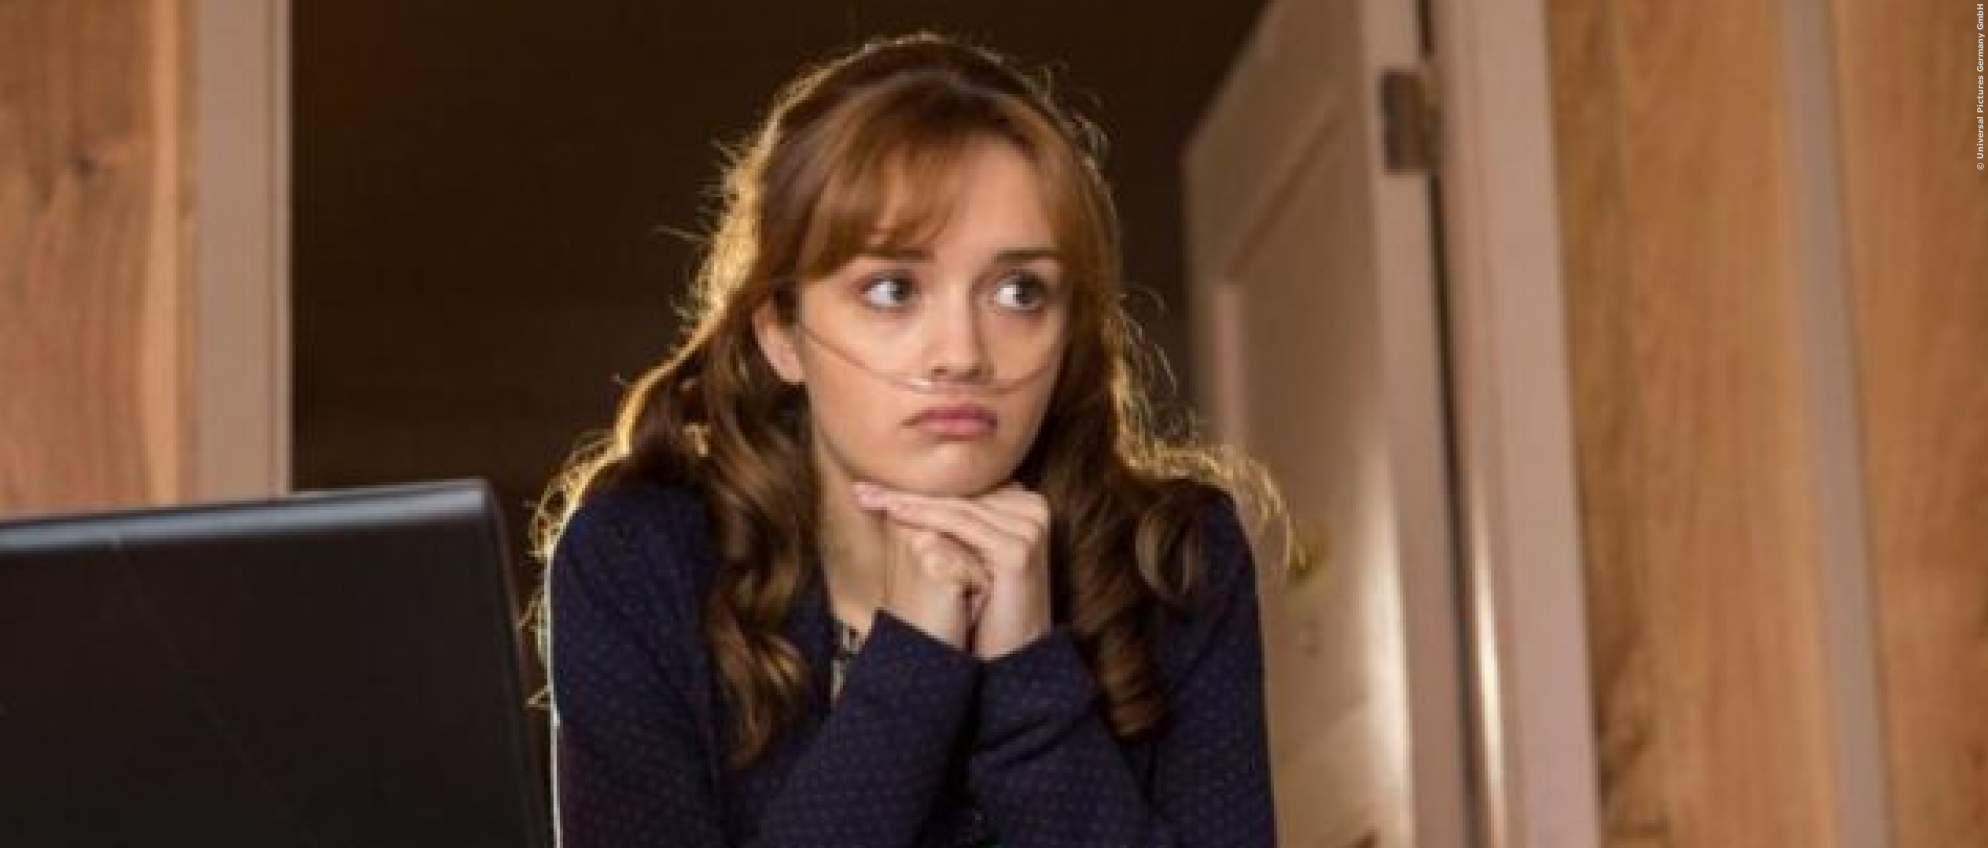 Olivia Cooke in Bates Motel